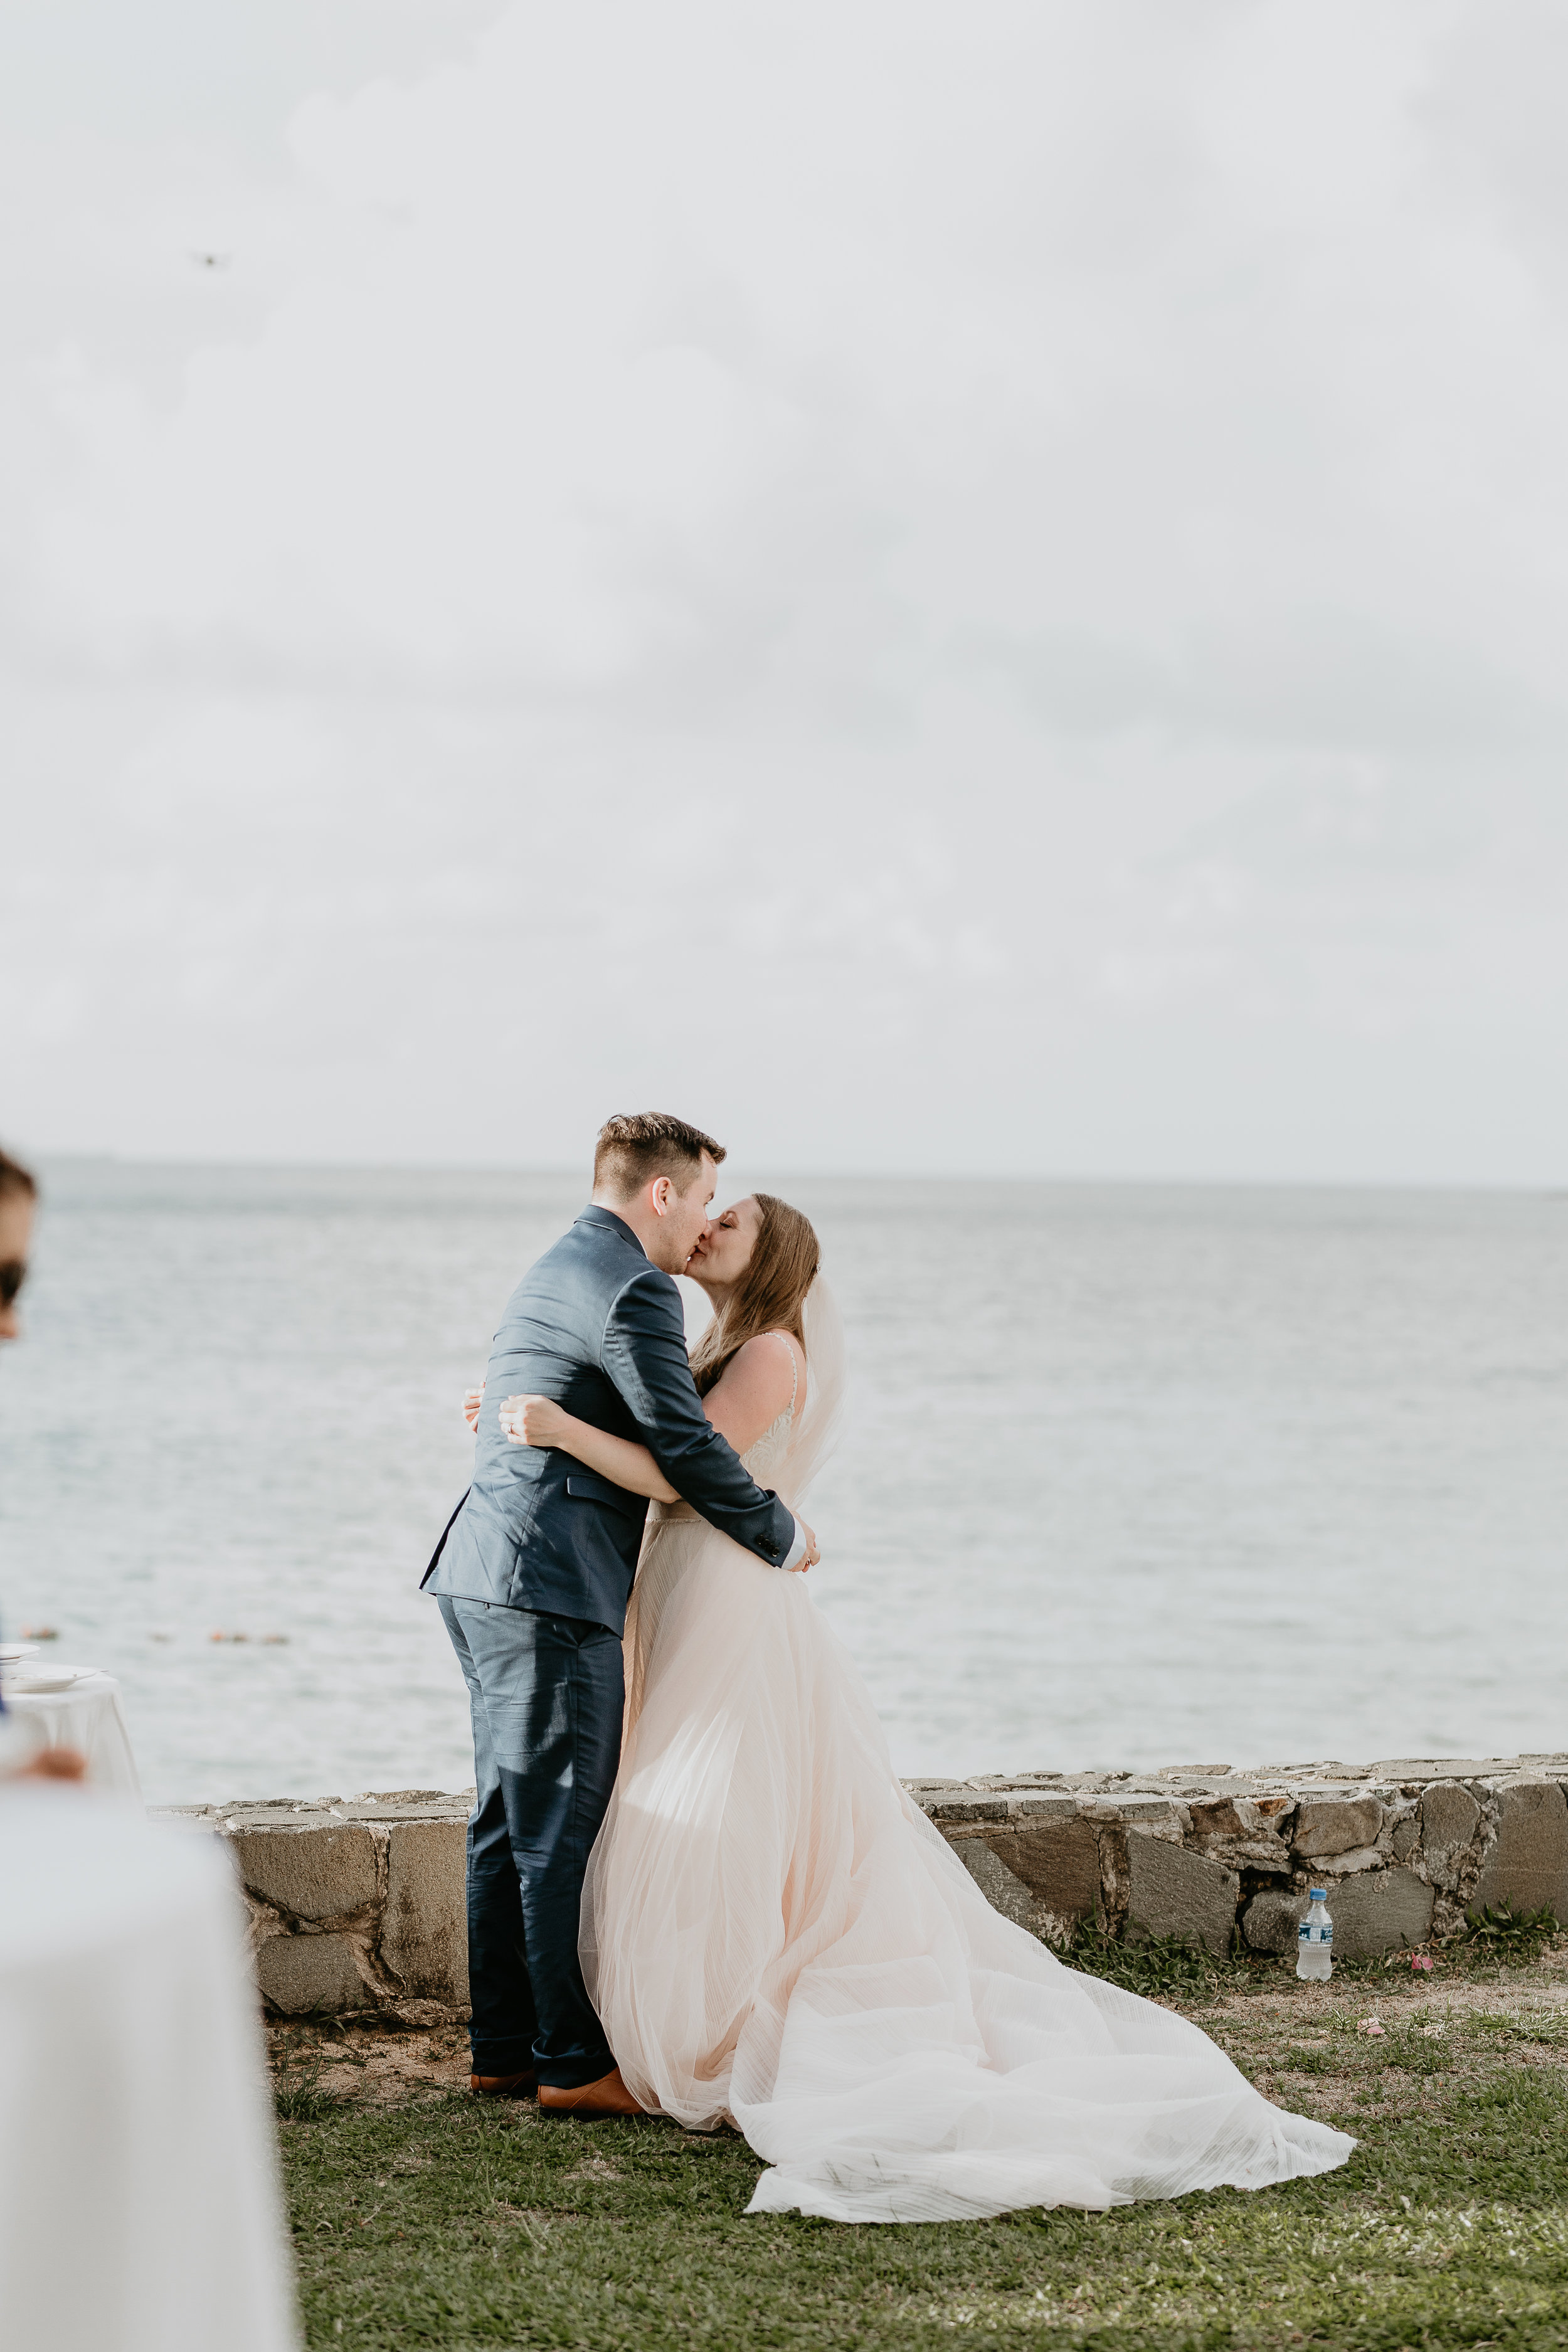 nicole-daacke-photography-destination-wedding-in-st-lucia-sandals-la-toc-intimate-island-wedding-carribean-elopement-photographer-chill-island-wedding-105.jpg